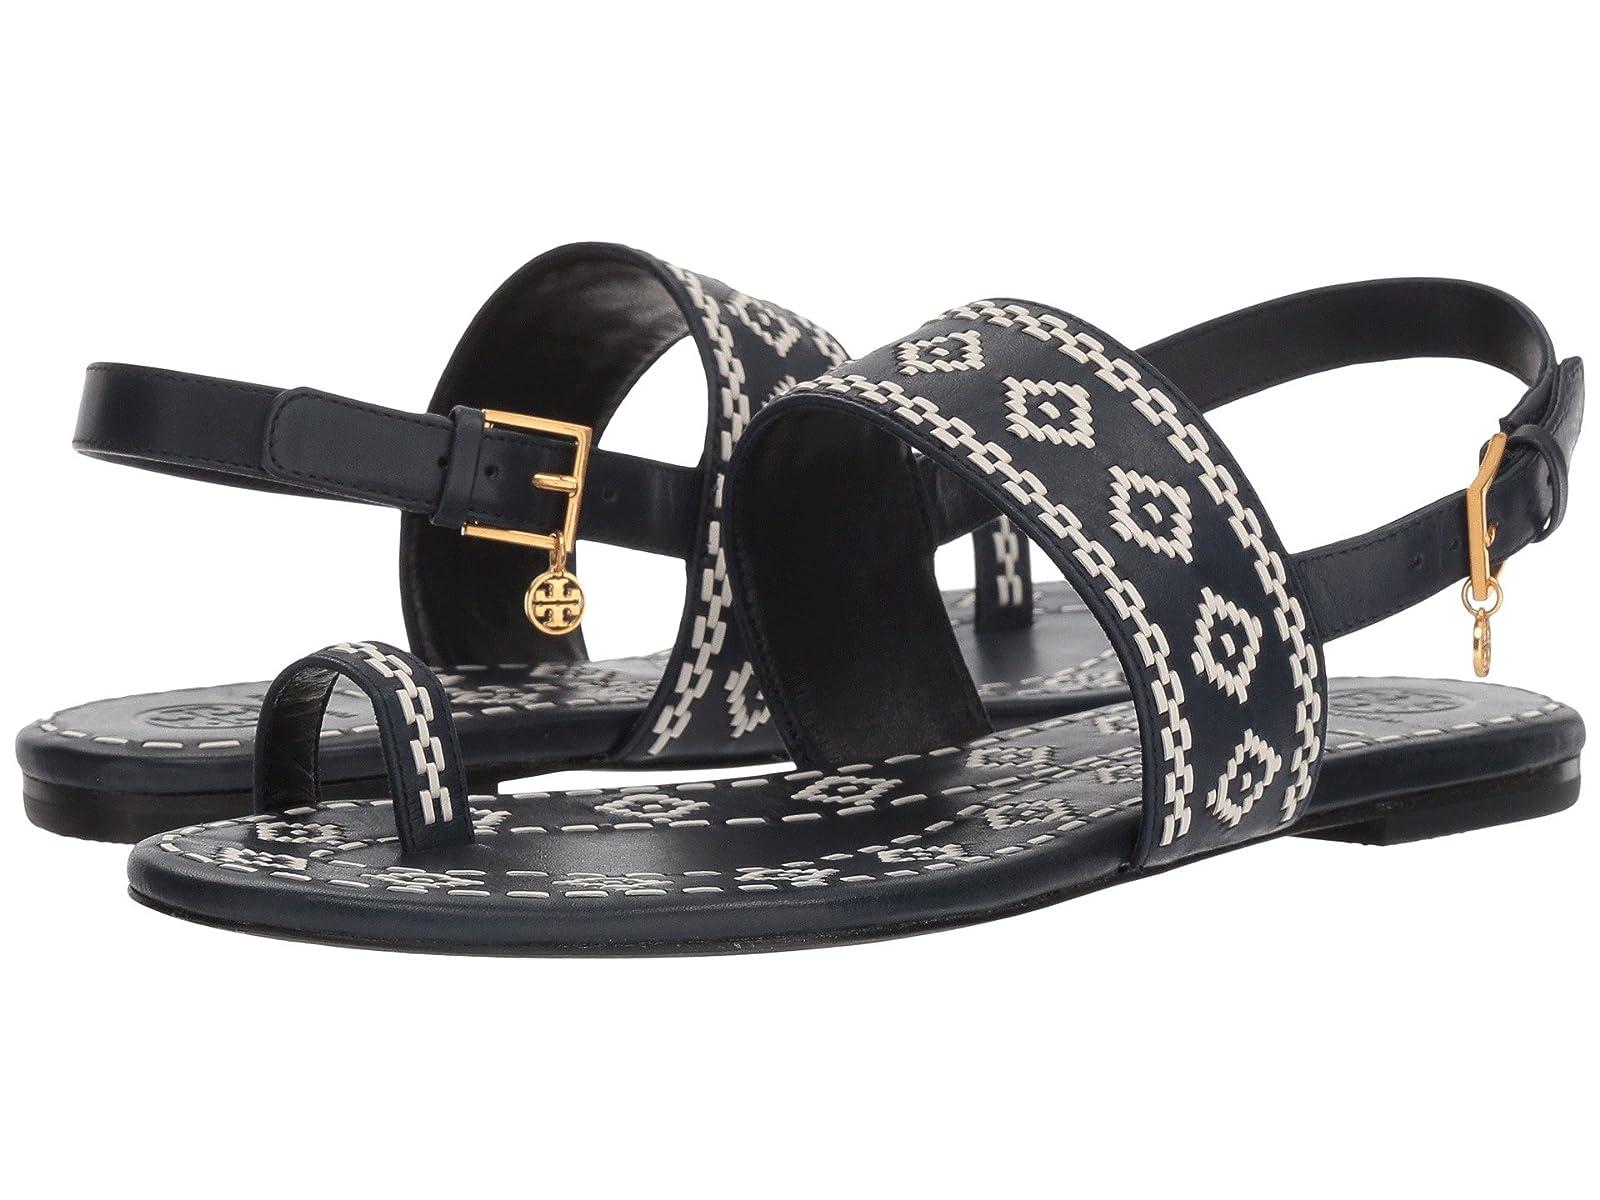 Tory Burch Blake Ankle-Strap SandalCheap and distinctive eye-catching shoes